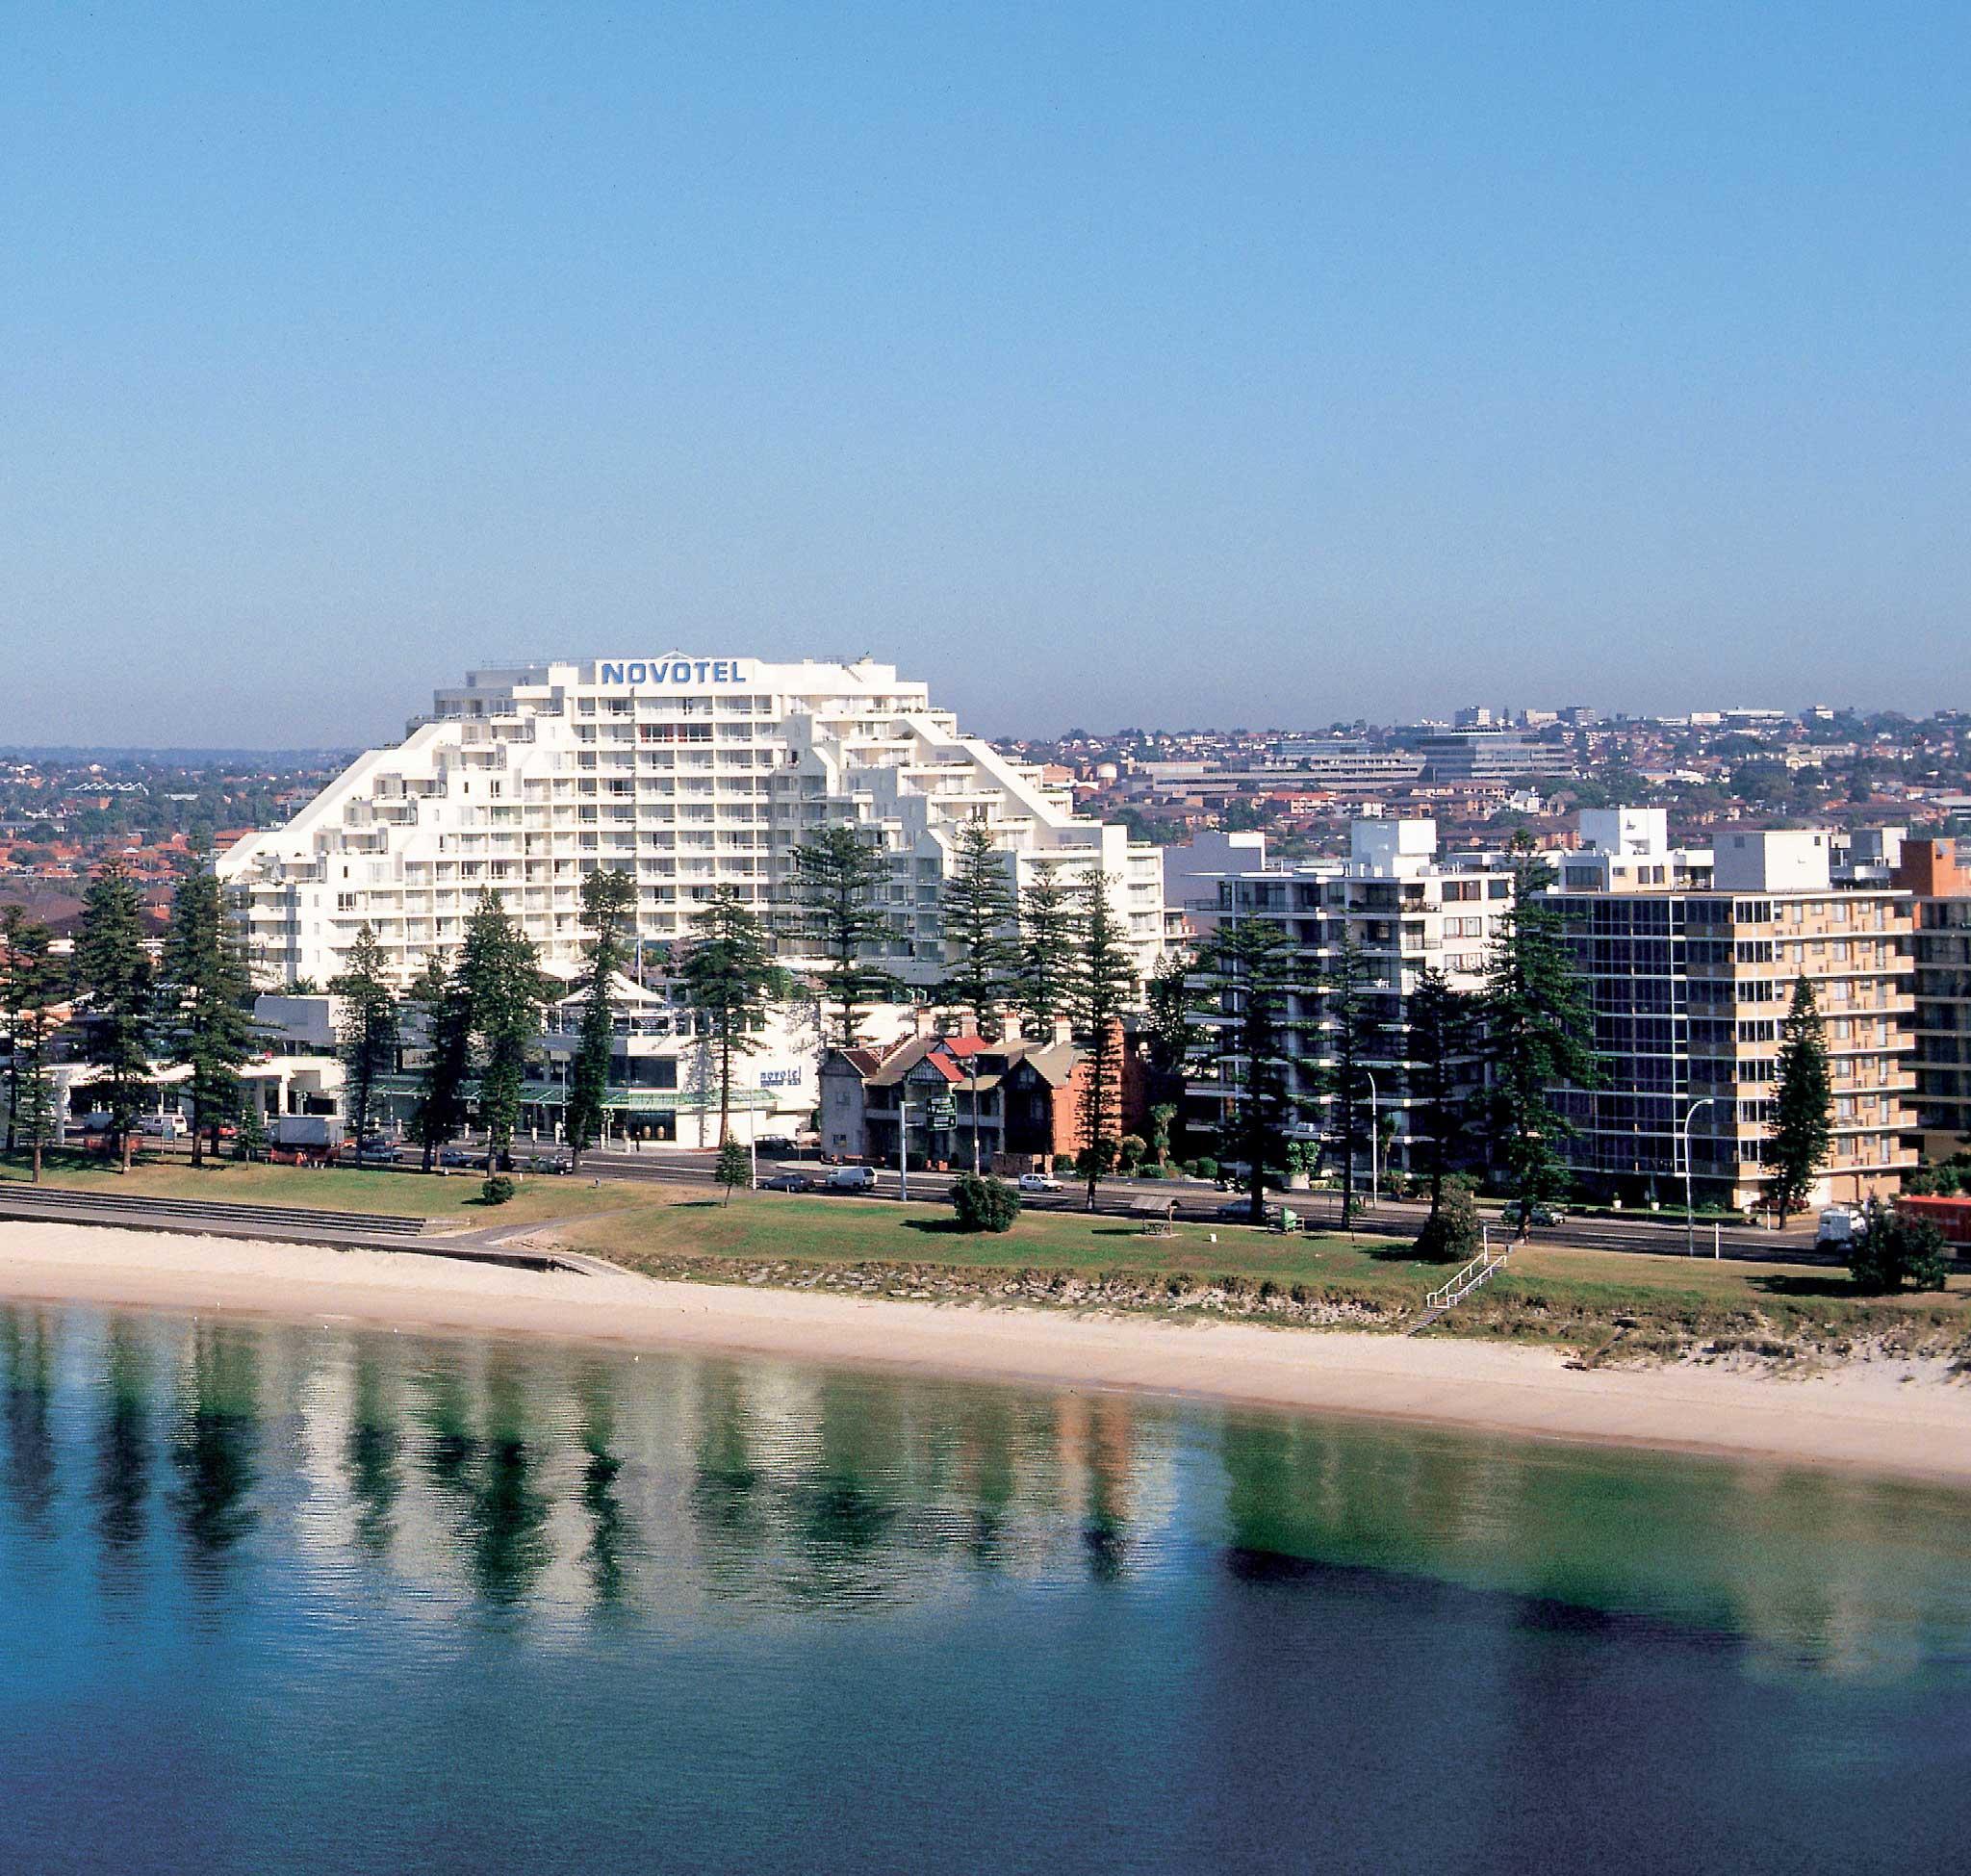 novotel sydney brighton beach accorhotels. Black Bedroom Furniture Sets. Home Design Ideas